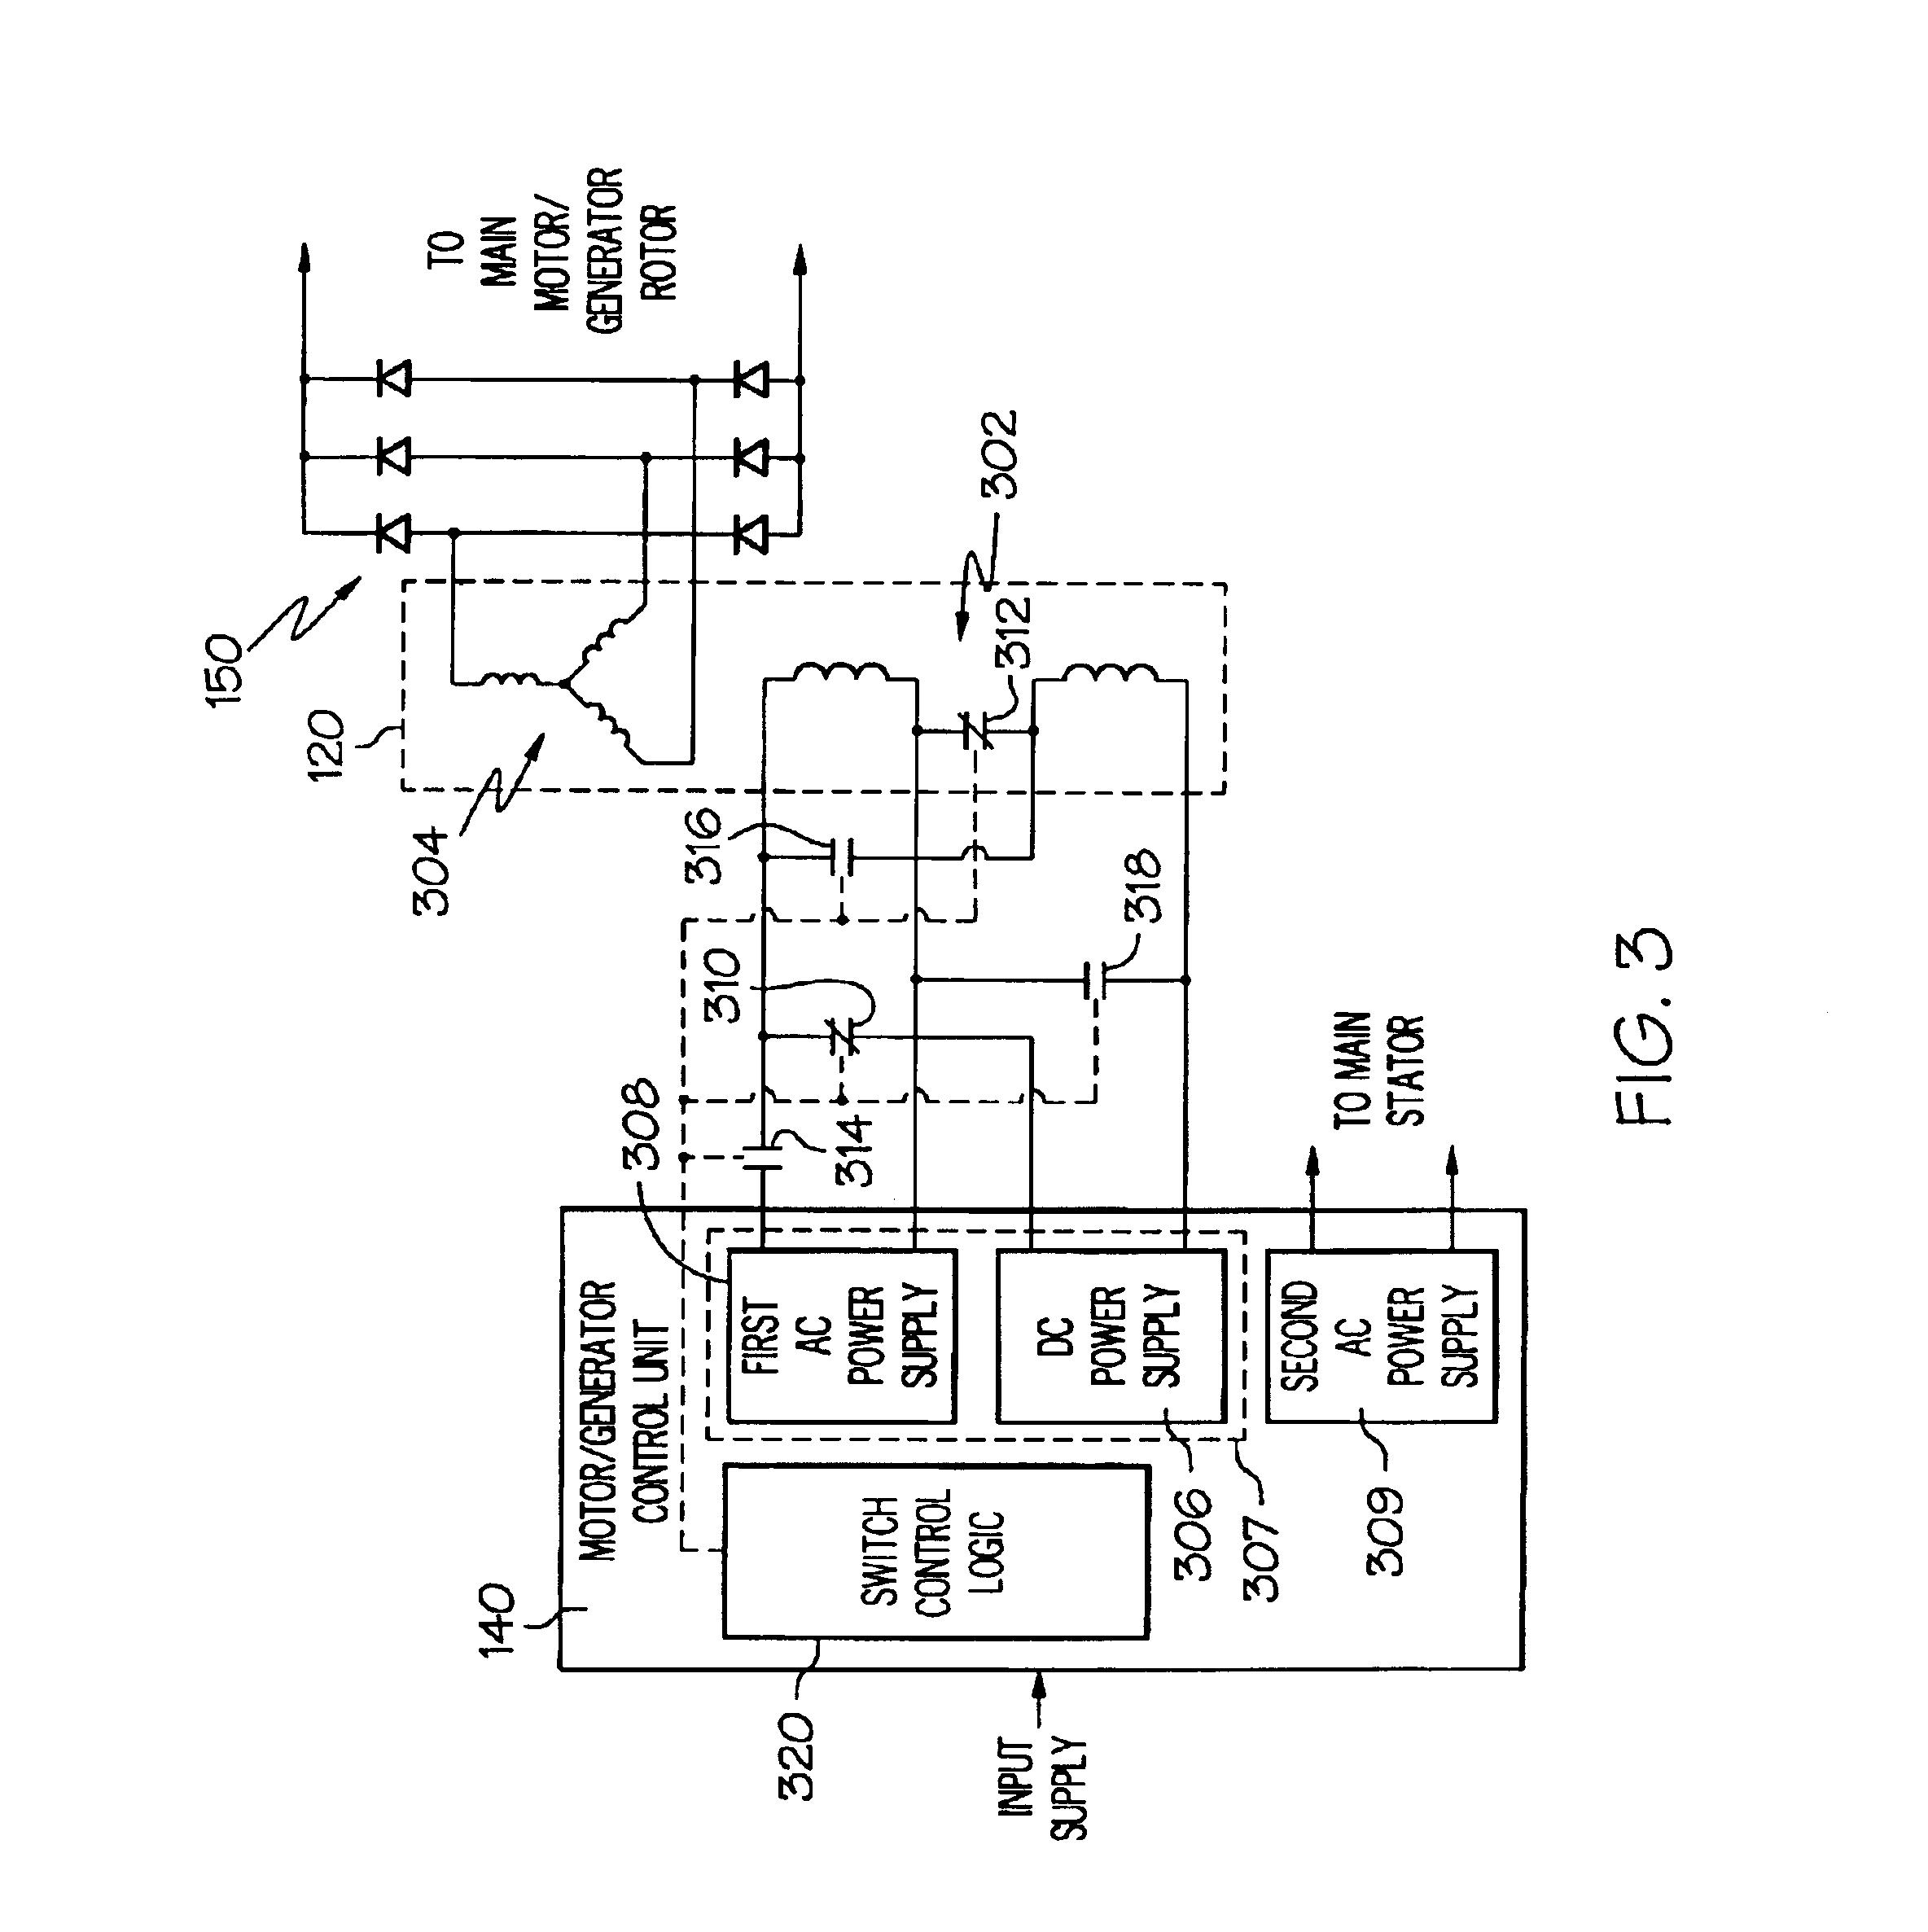 four prong trailer wiring diagram four discover your wiring on simple 4 flat wiring diagram for a trailer